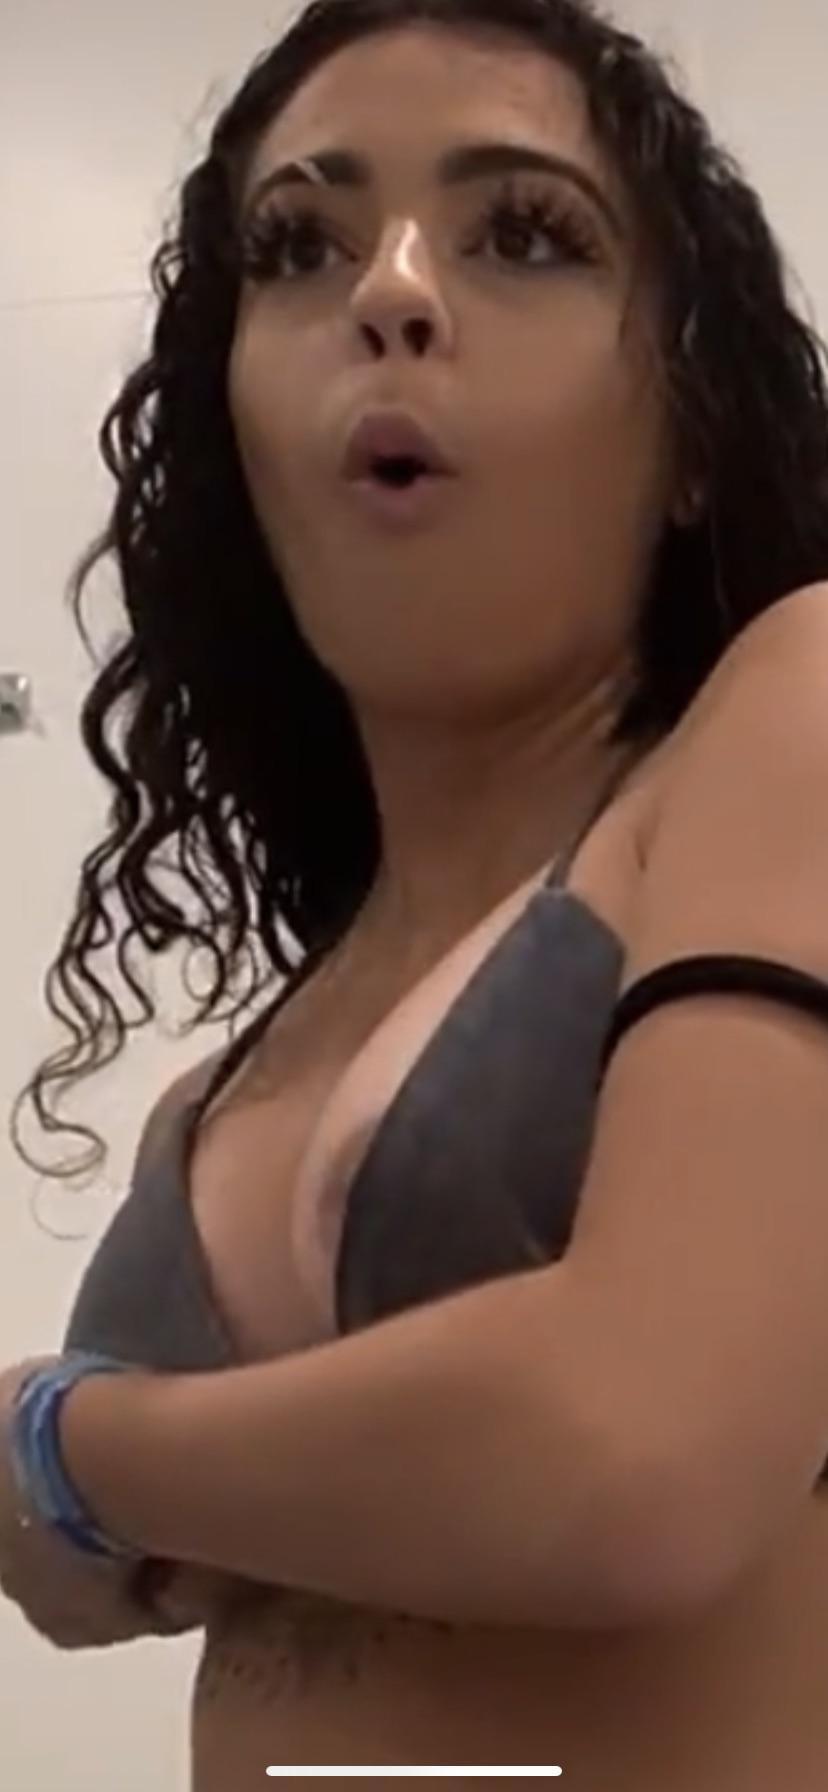 Accidental Nip Slip Reddit photo 13